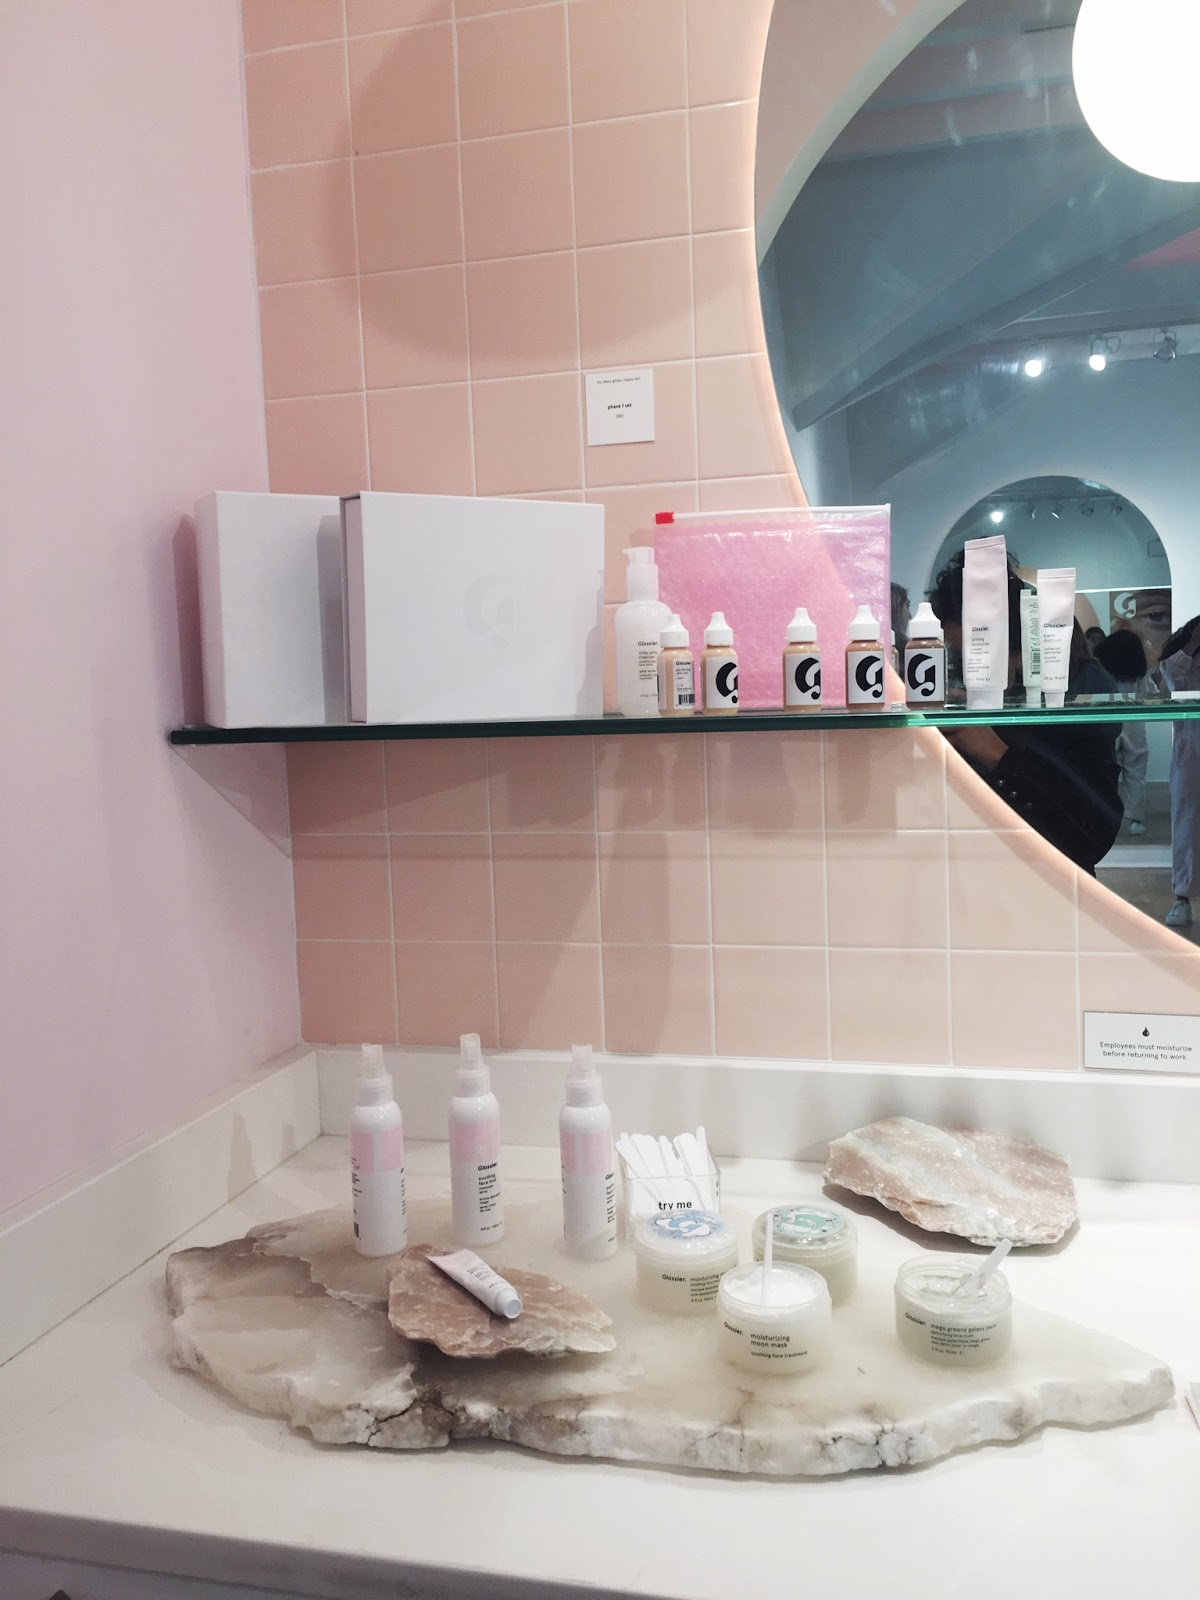 glossier showroom, glossier store, glossier popup, glossier shop, glossier nyc, glossier nyc showroom